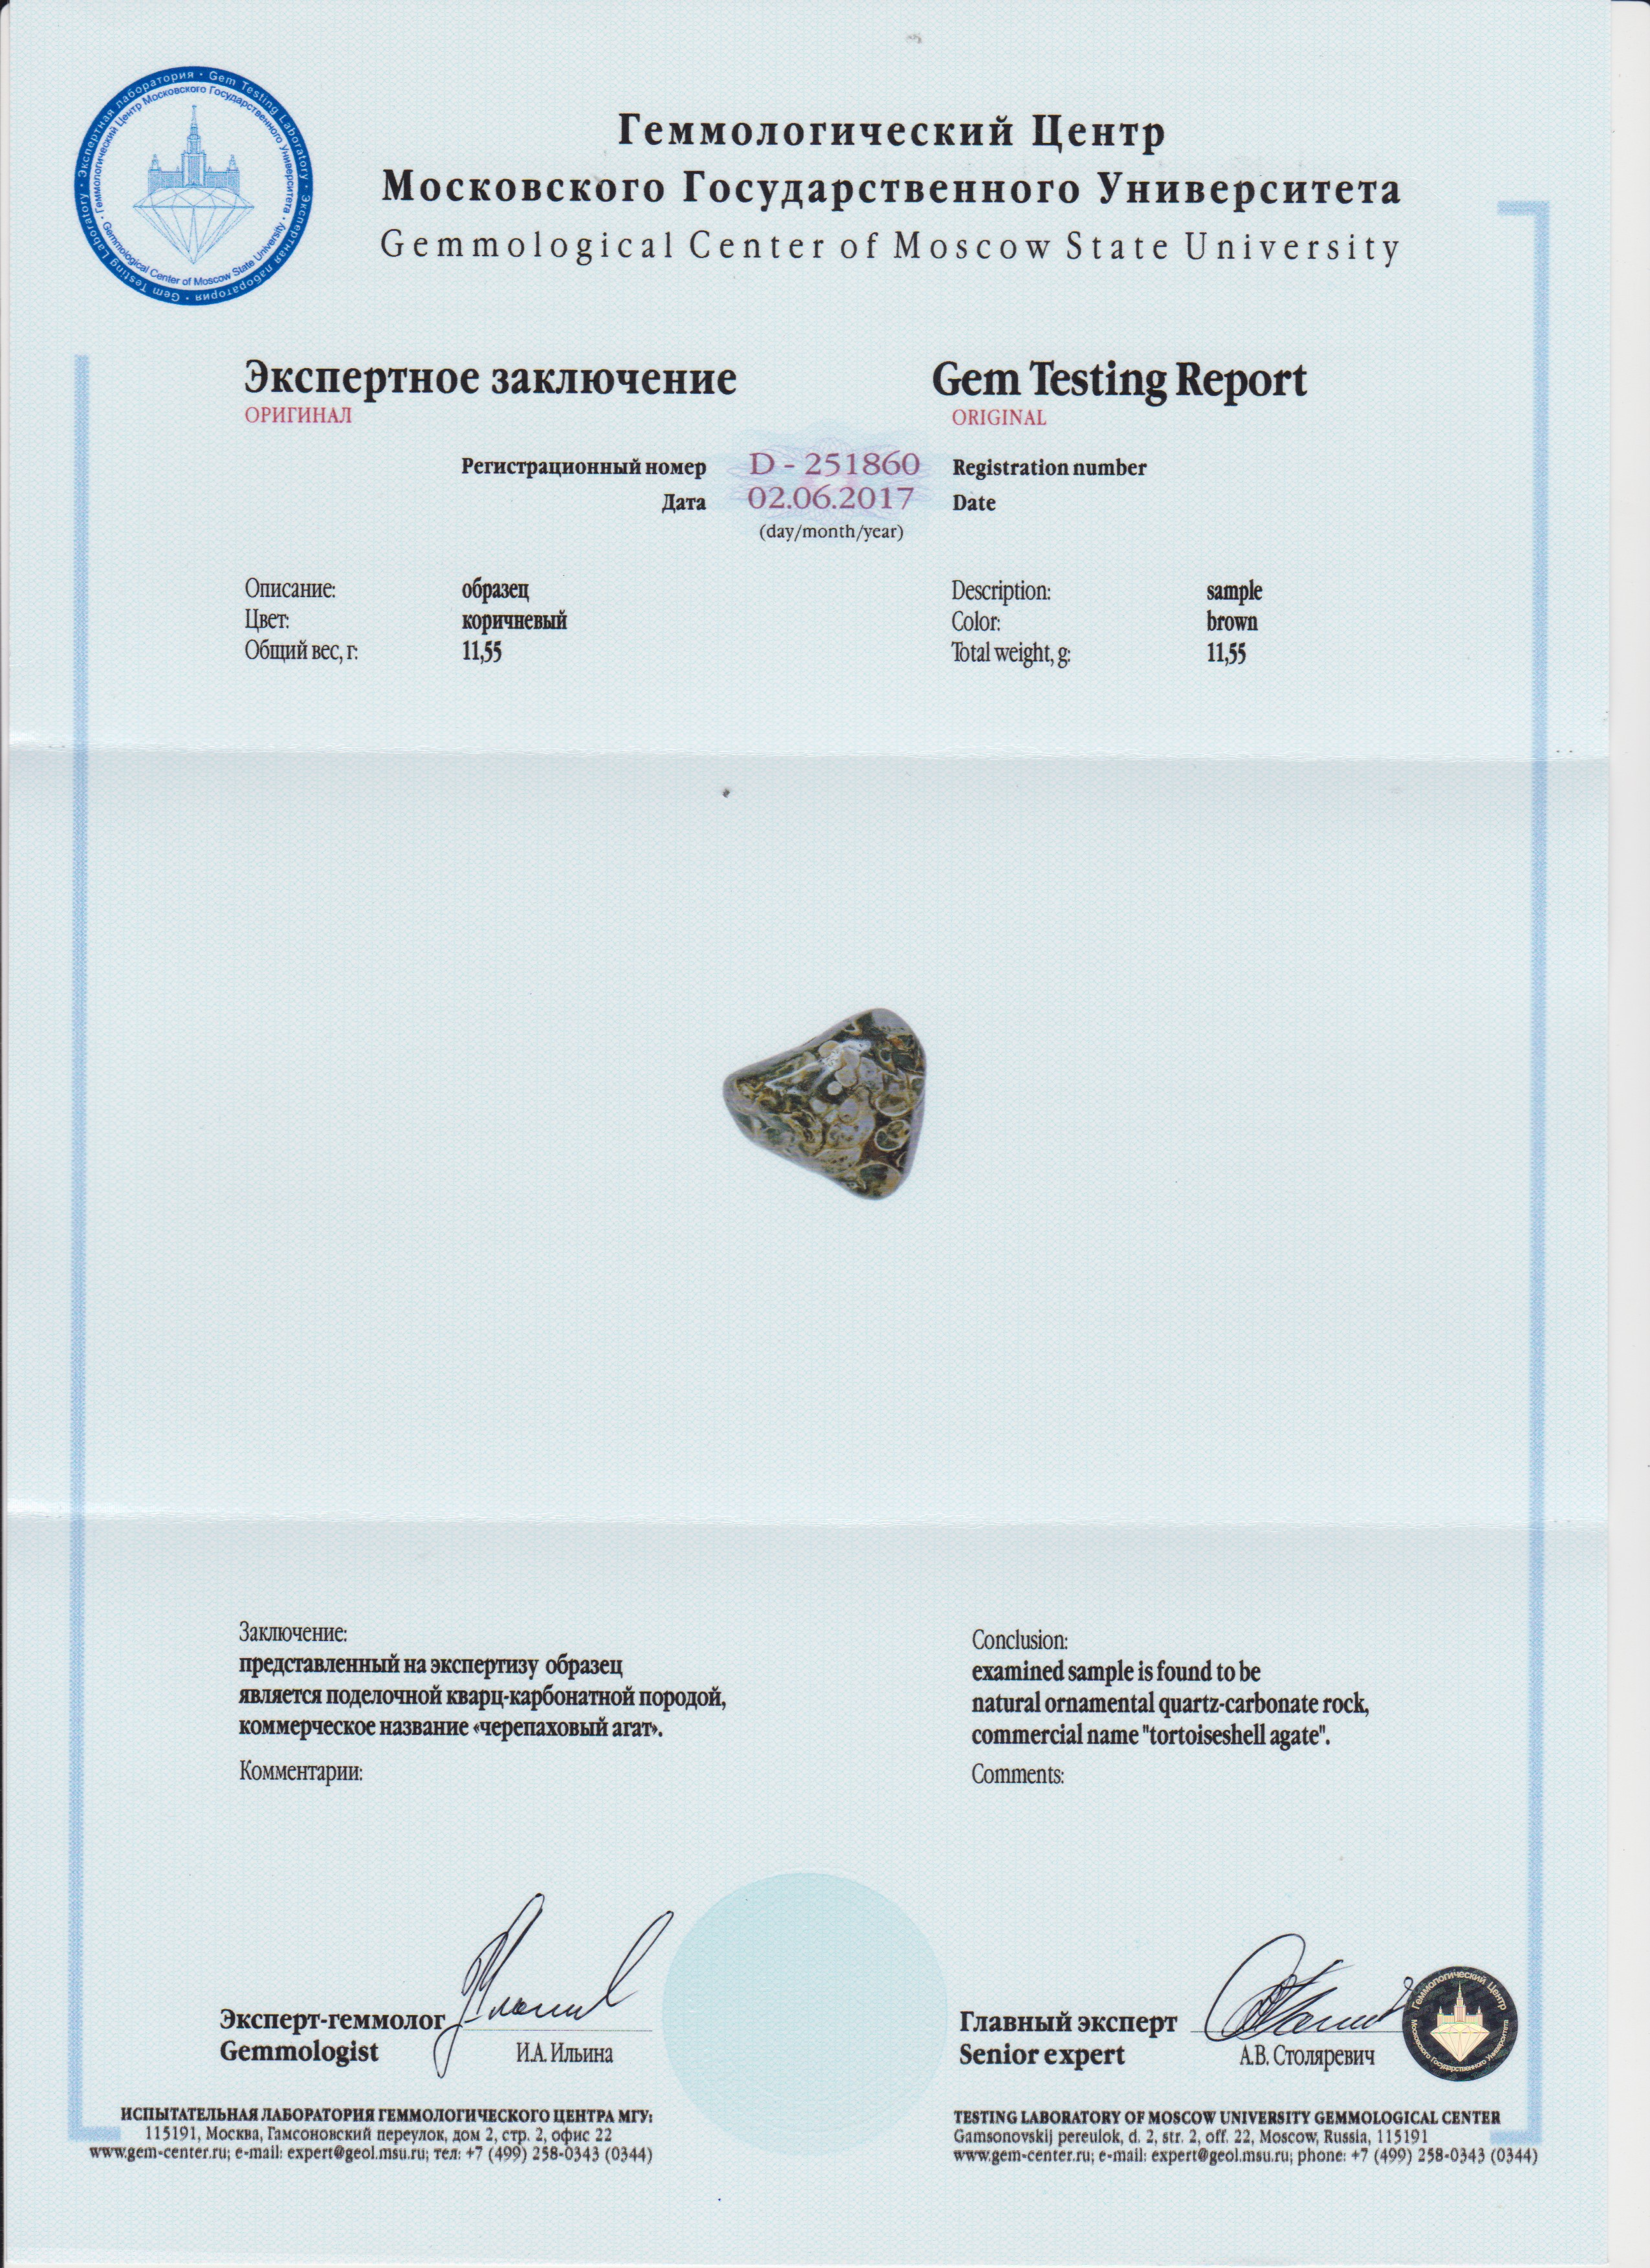 https://mineralmarket.ru/img/certificate/2/1497885234.jpg